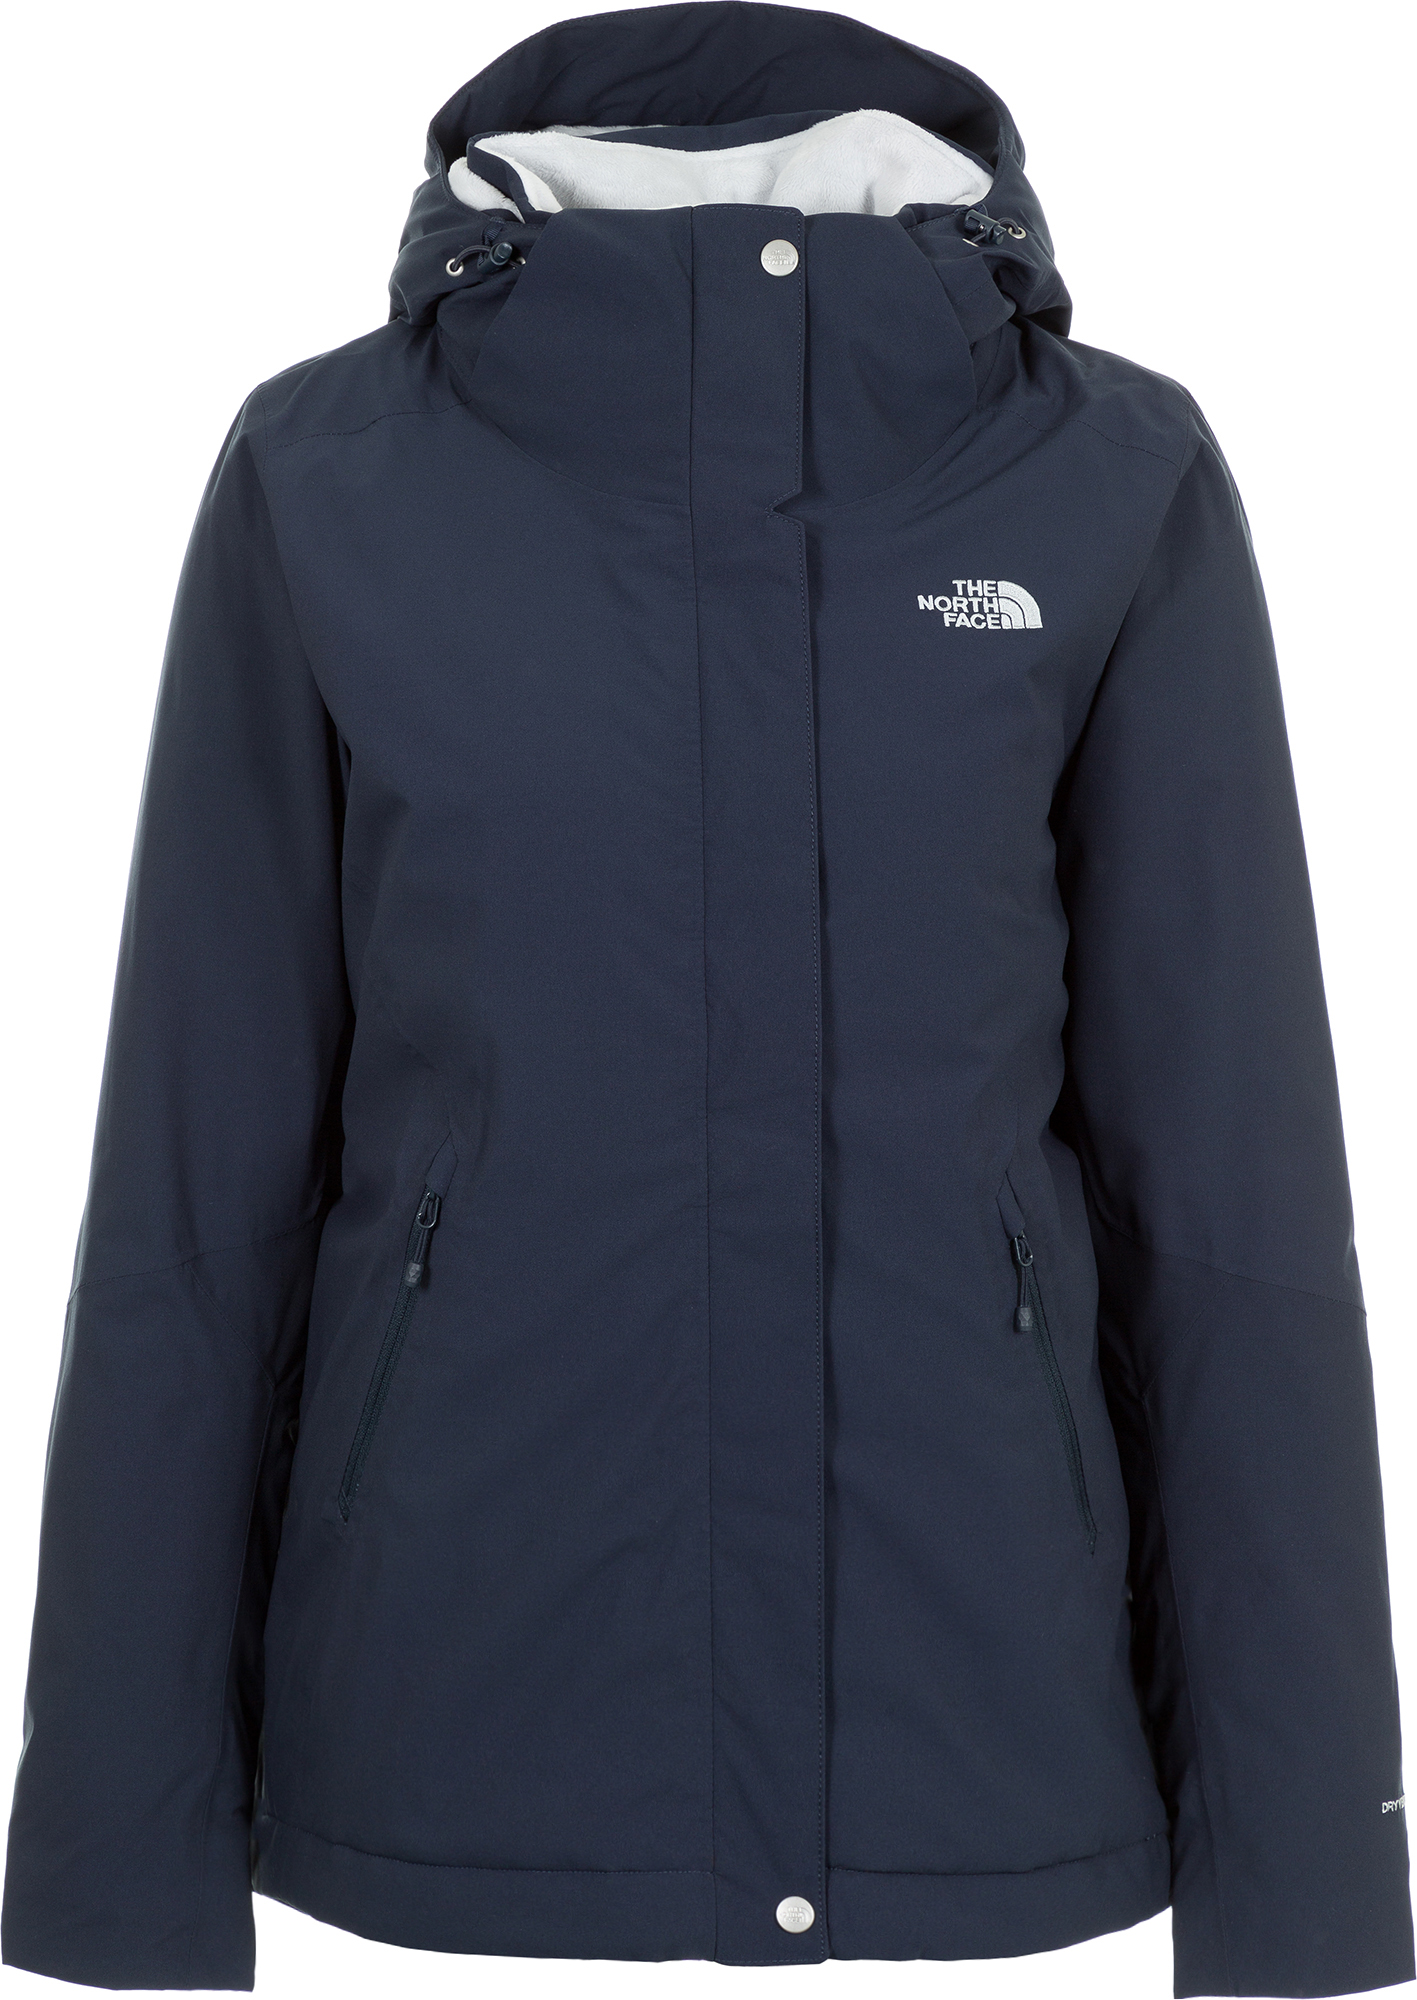 The North Face Куртка утепленная женская The North Face Inlux Insulated, размер 46 цены онлайн